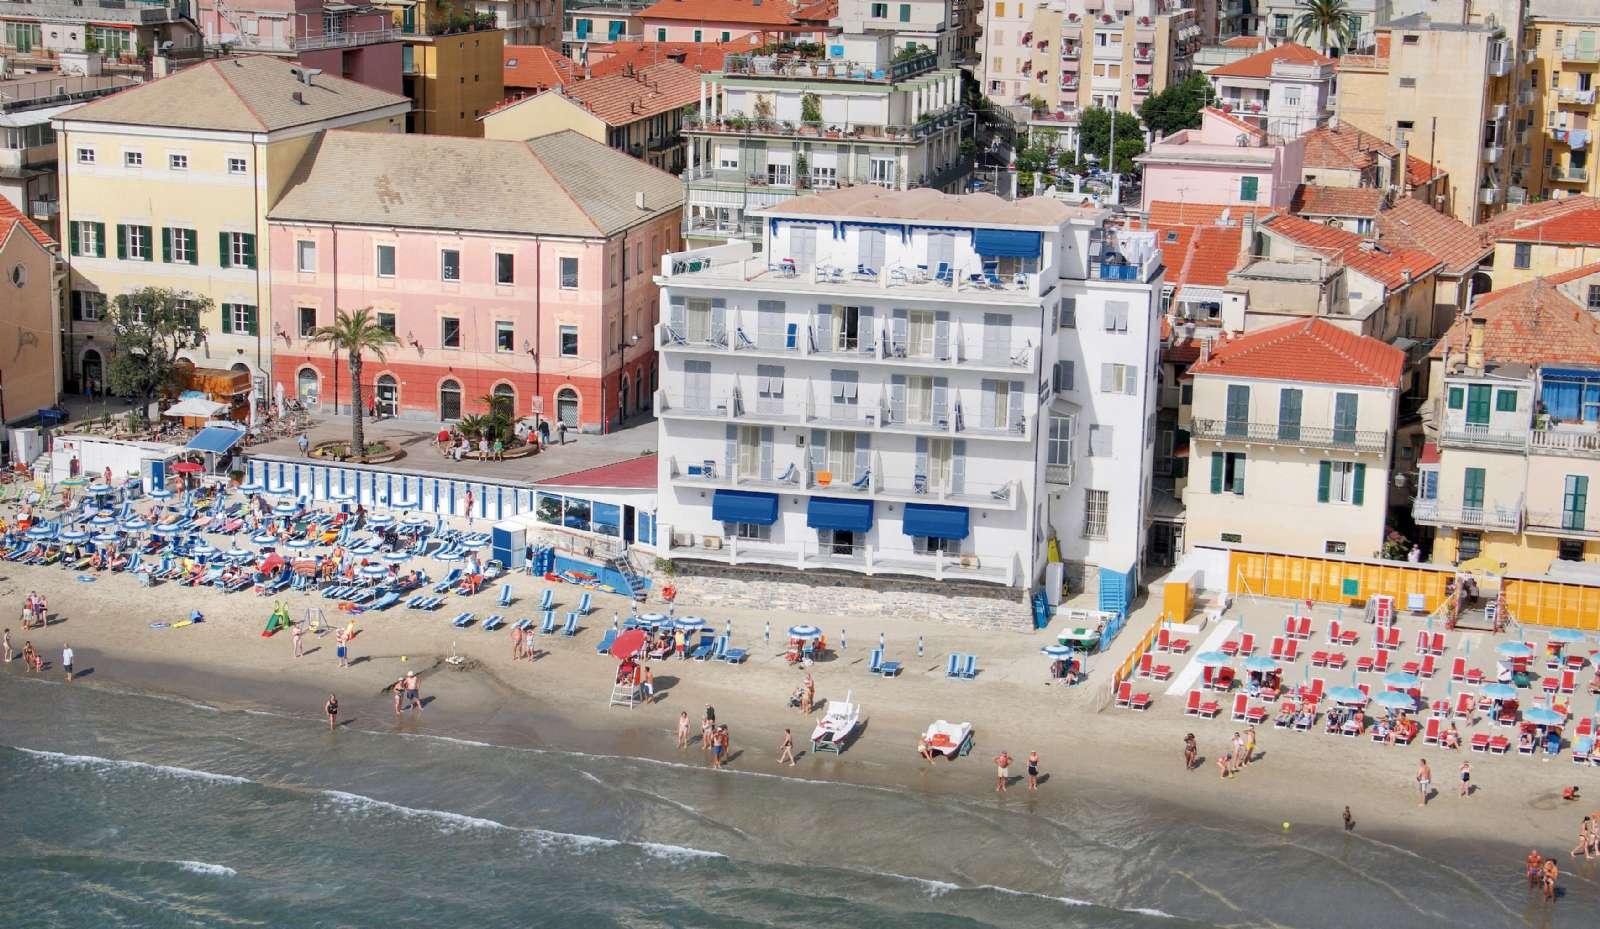 Hotel Milano (den hvide bygning) ligger helt nede i strandkanten